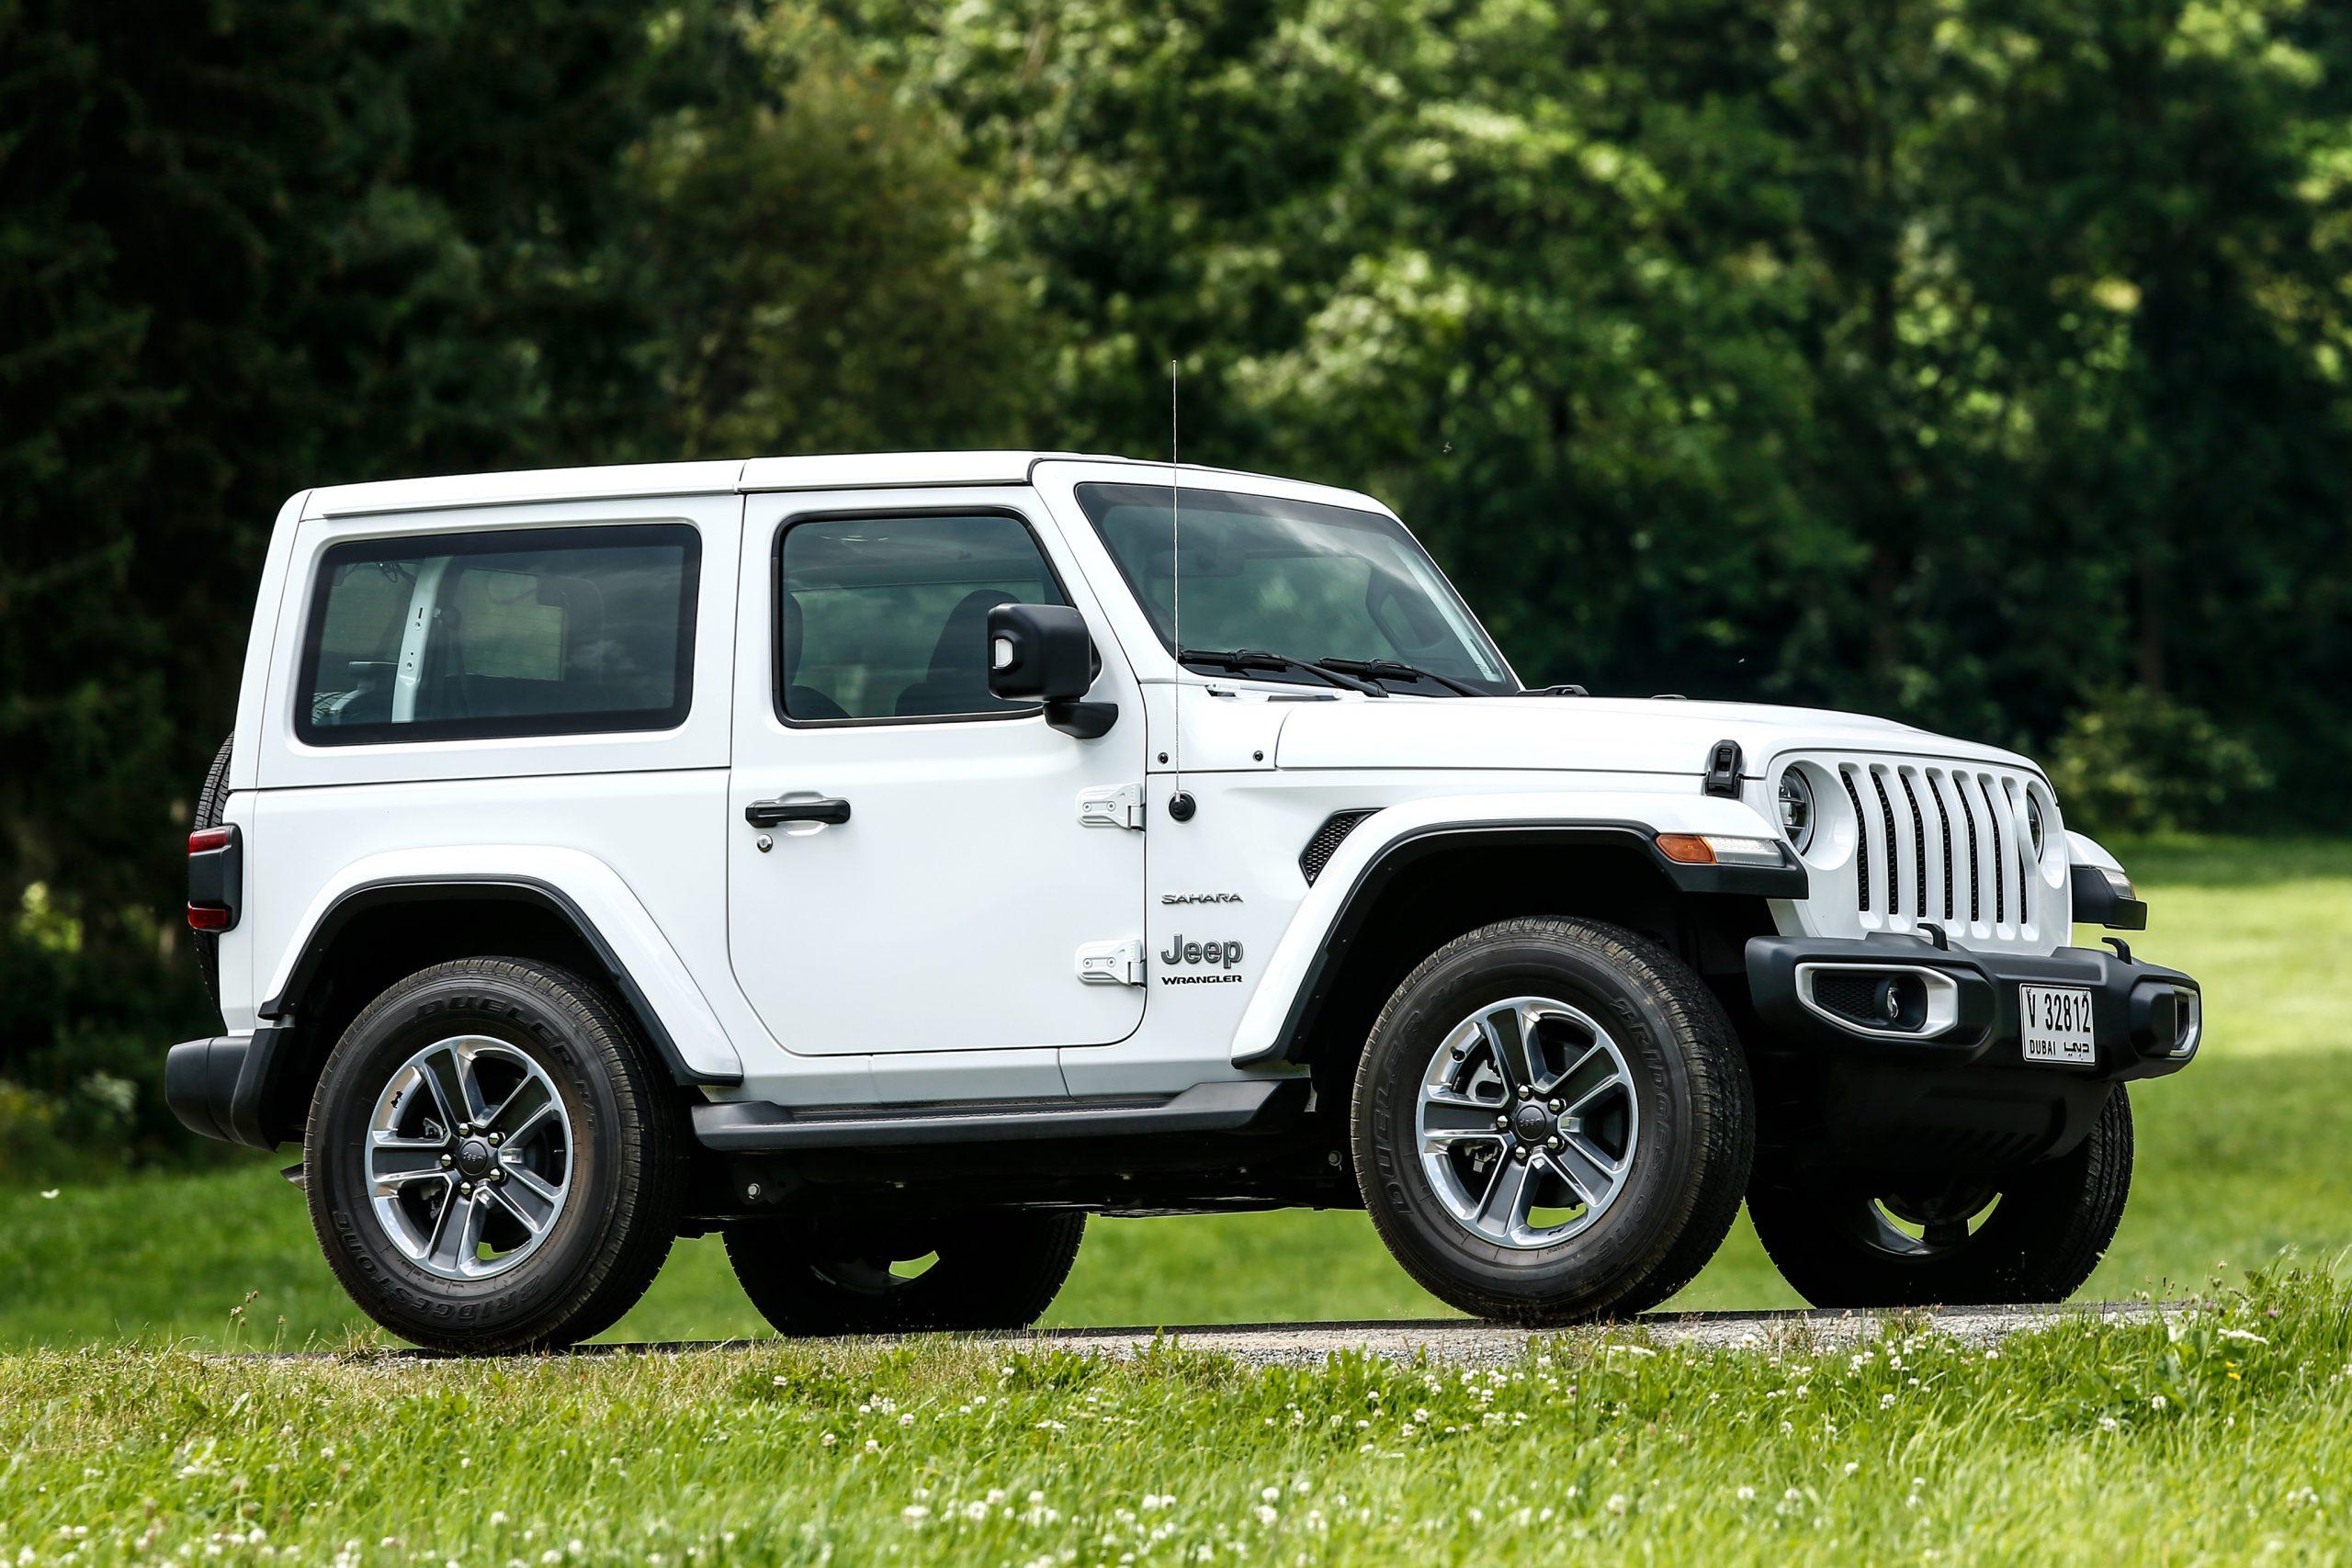 jeep wrangler sahara 5 portas branco lateral